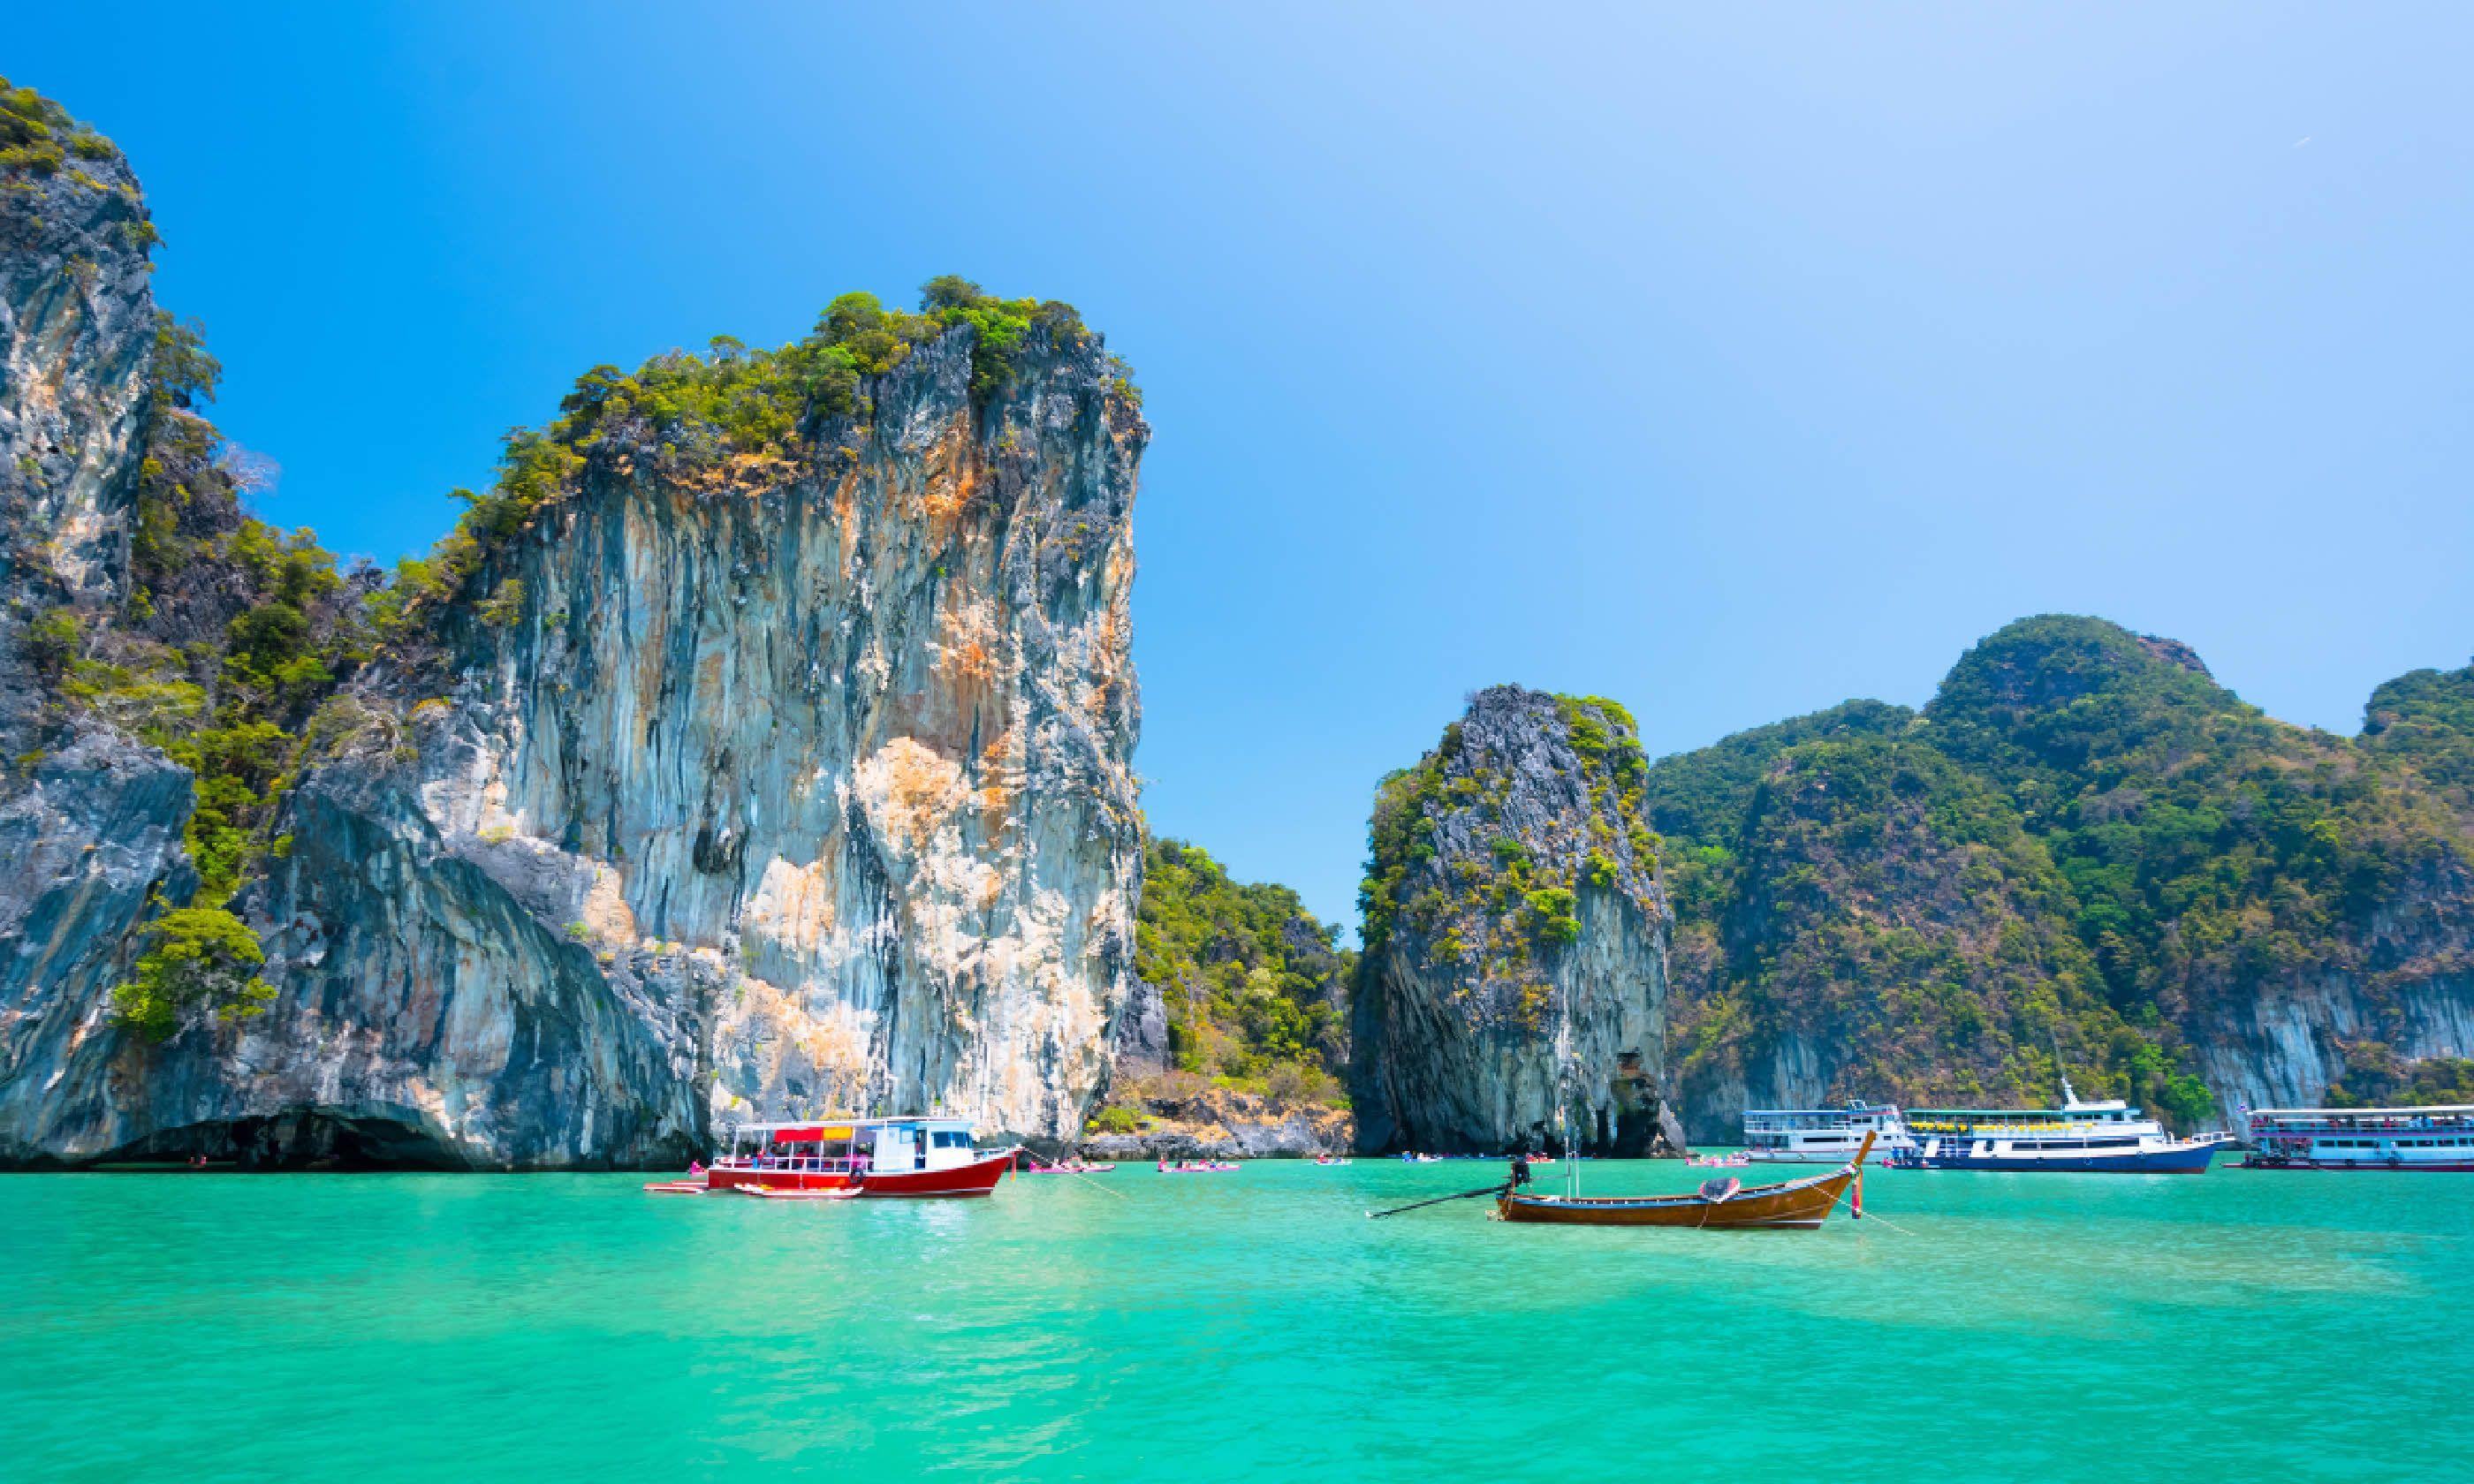 Phuket, Thailand (Shutterstock)